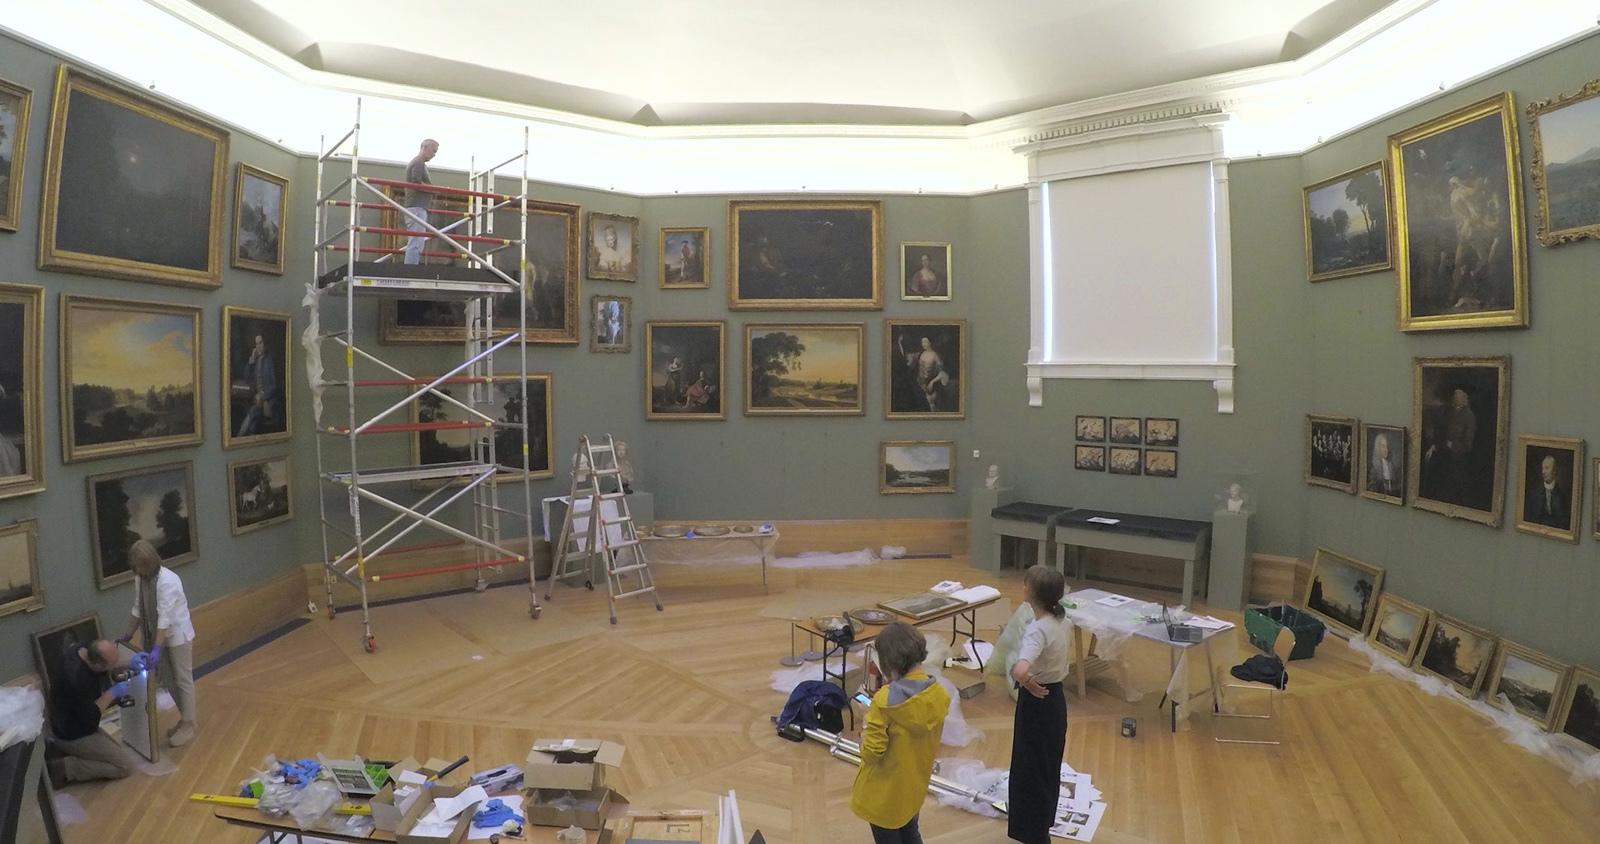 Time-lapse-of-exhibition-room-SOA.jpg#asset:13804